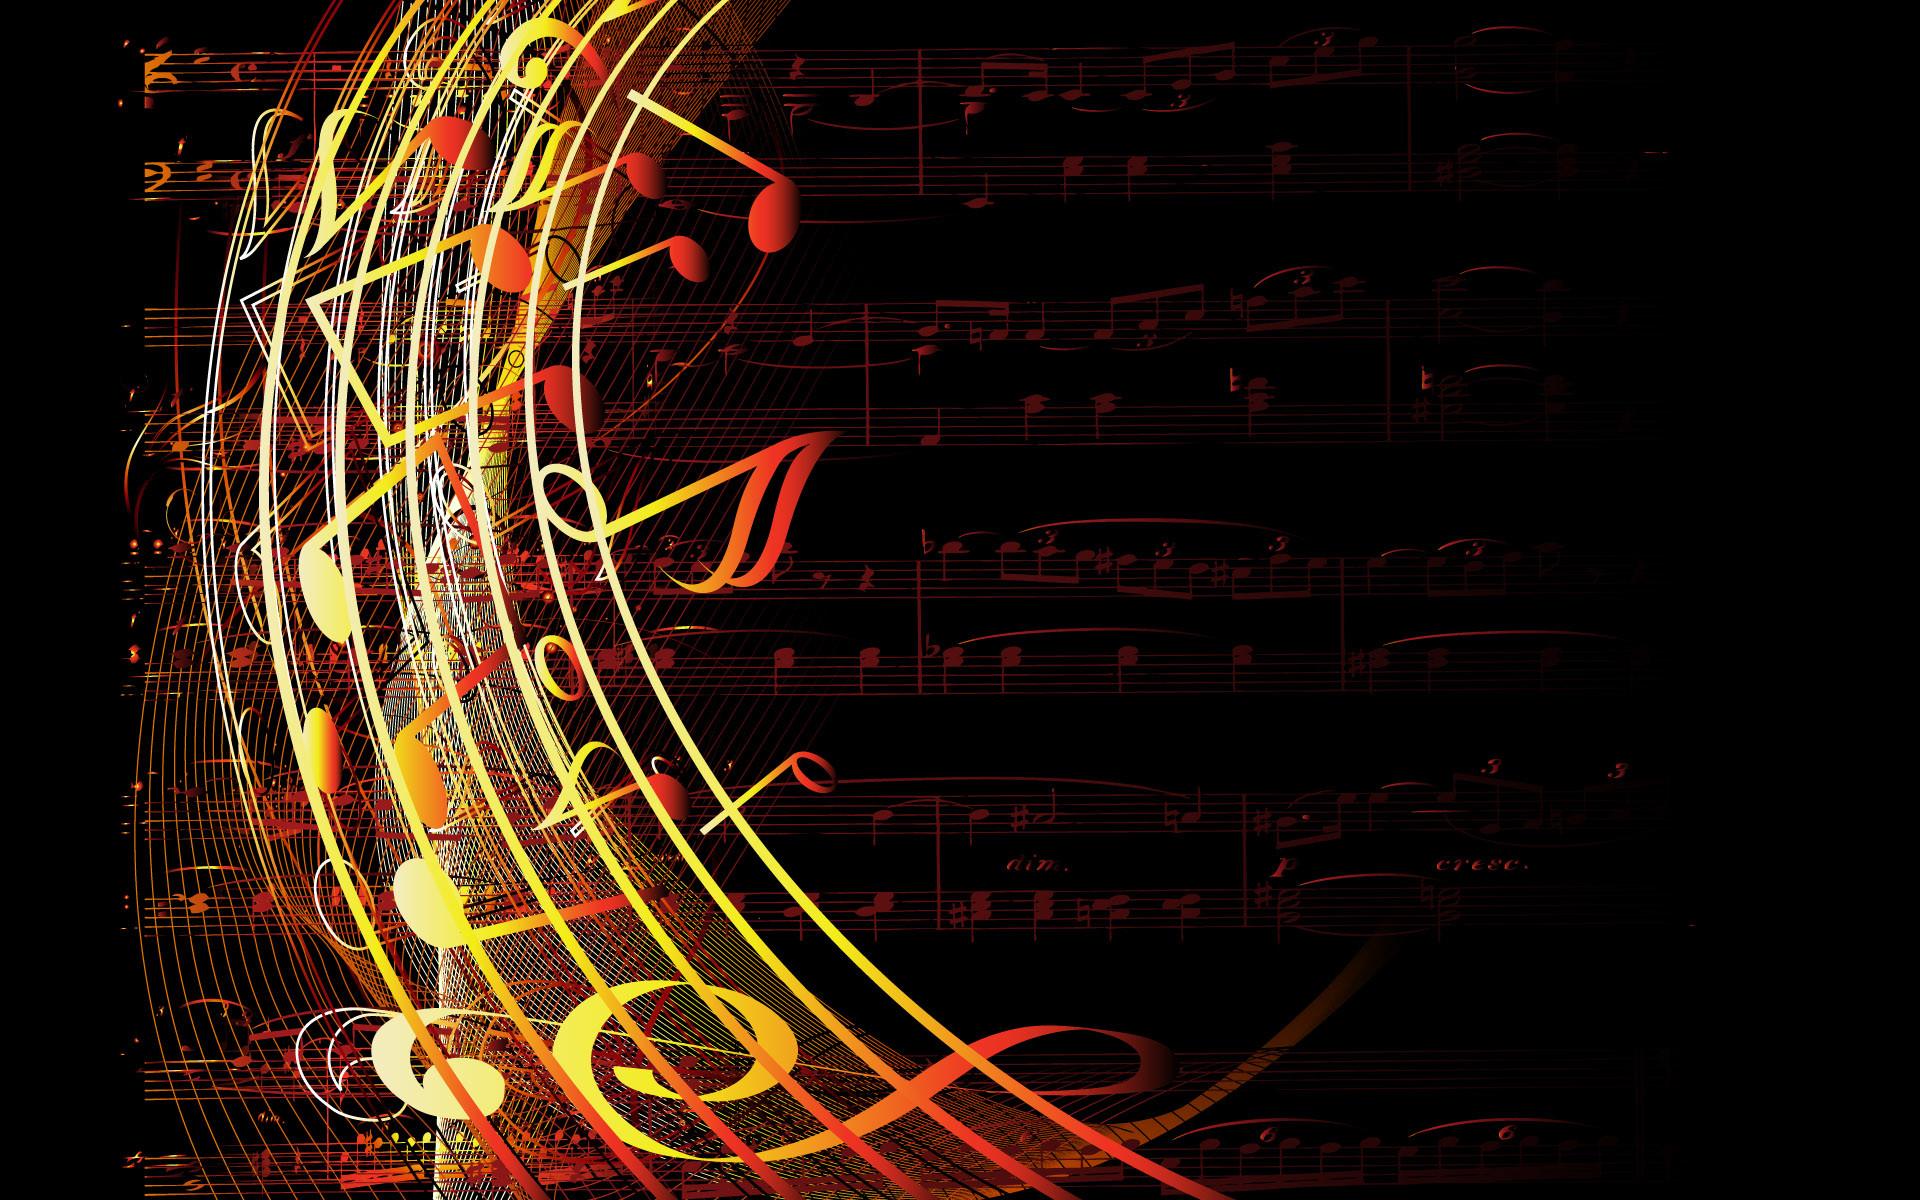 Test_Music_Note_1.jpg